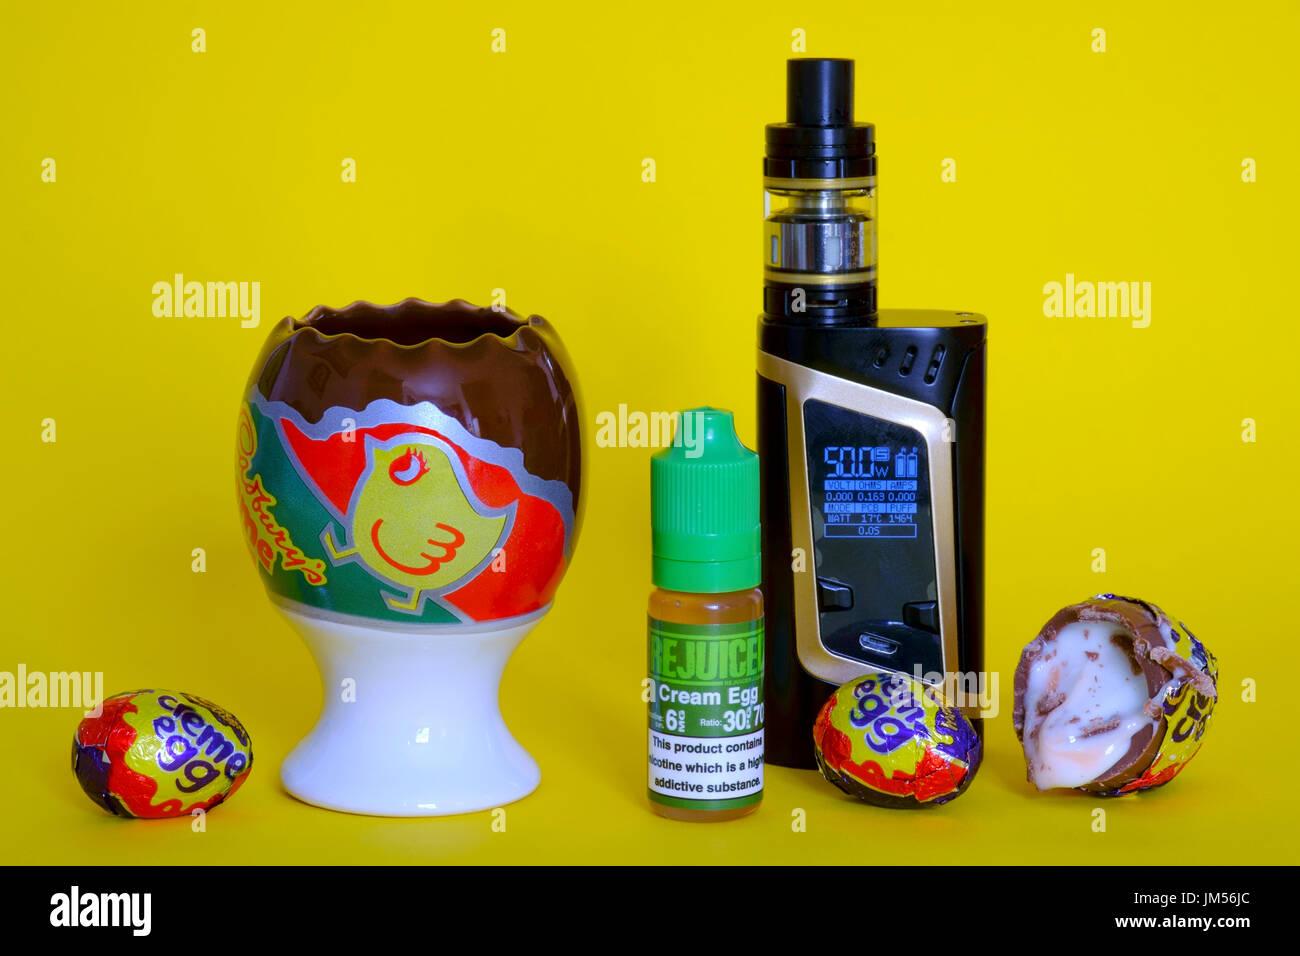 e liquids for electronic device vaping and vaporising mod - Stock Image